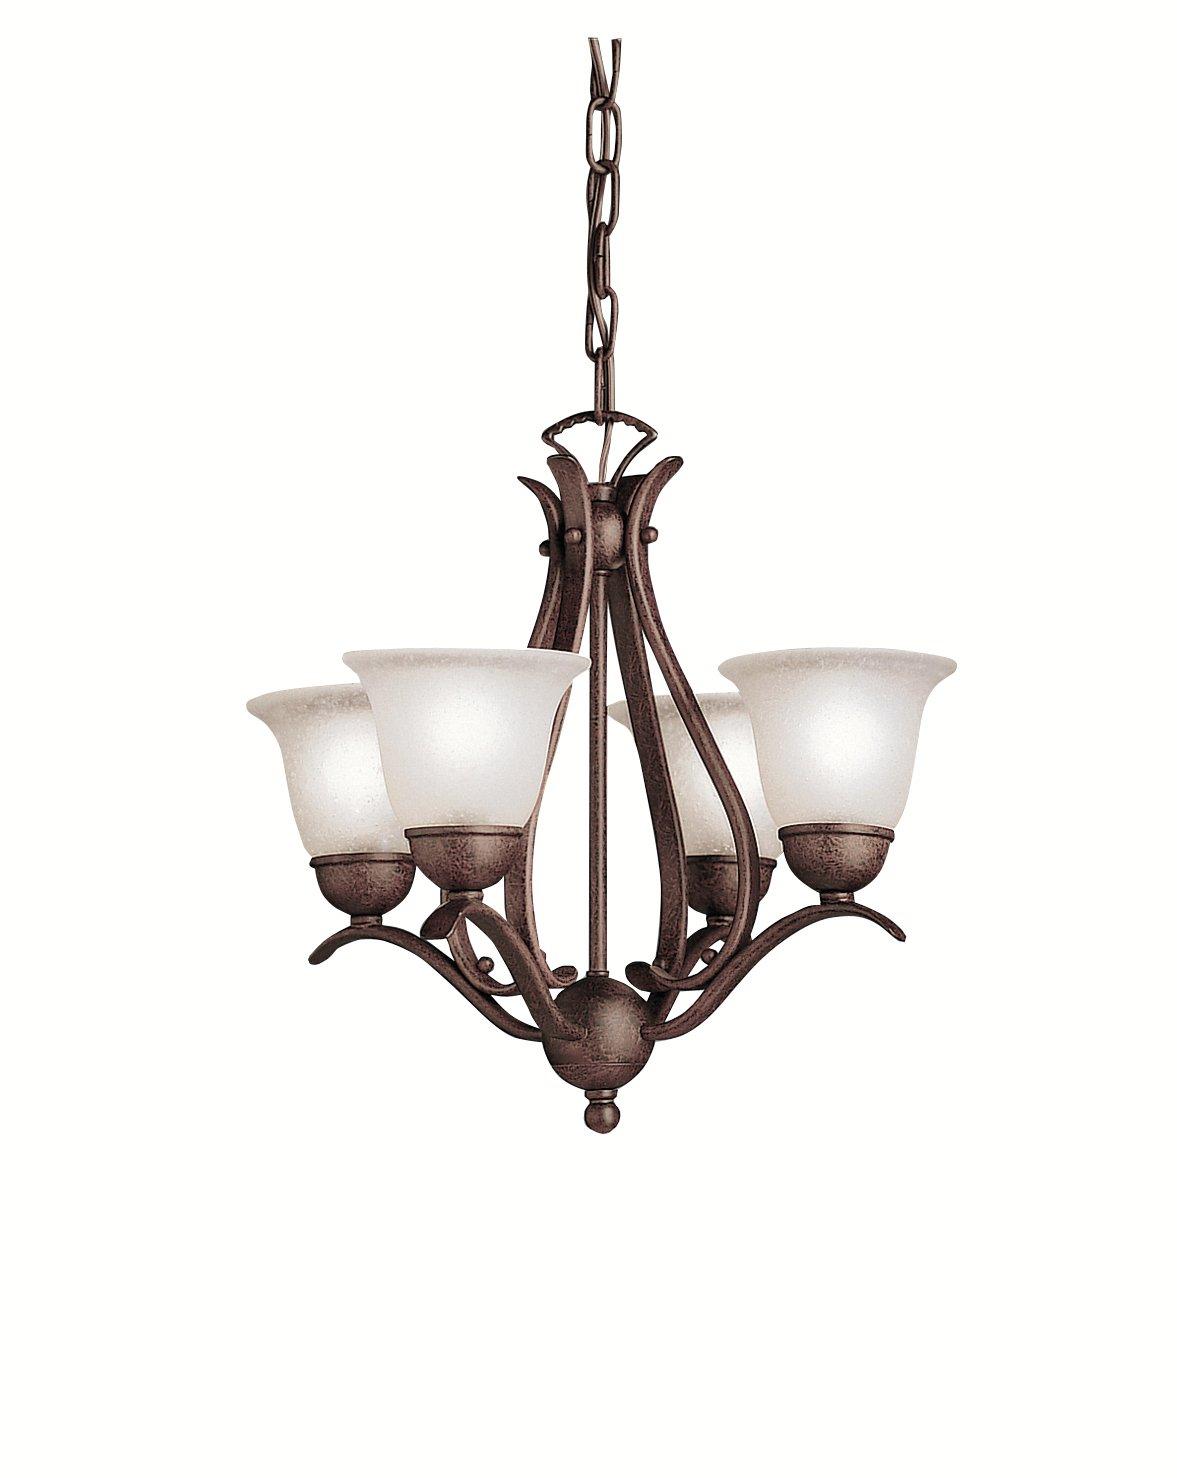 Kichler 2019ni dover mini chandelier 4 light brushed nickel kichler 2019ni dover mini chandelier 4 light brushed nickel dining room light fixtures amazon aloadofball Choice Image